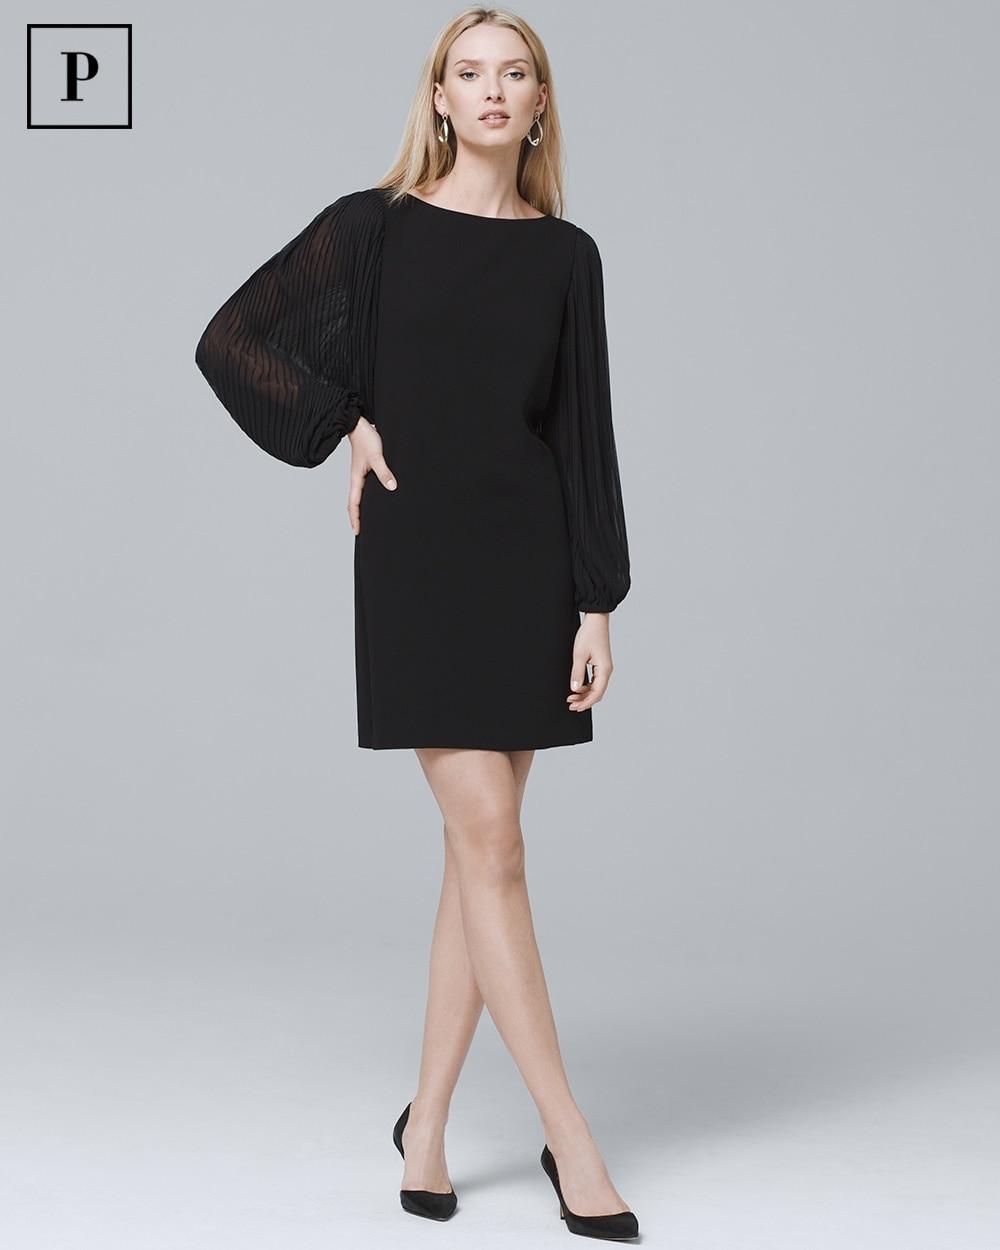 99de957487 Return to thumbnail image selection Petite Chiffon Sleeve Black Shift Dress  video preview image